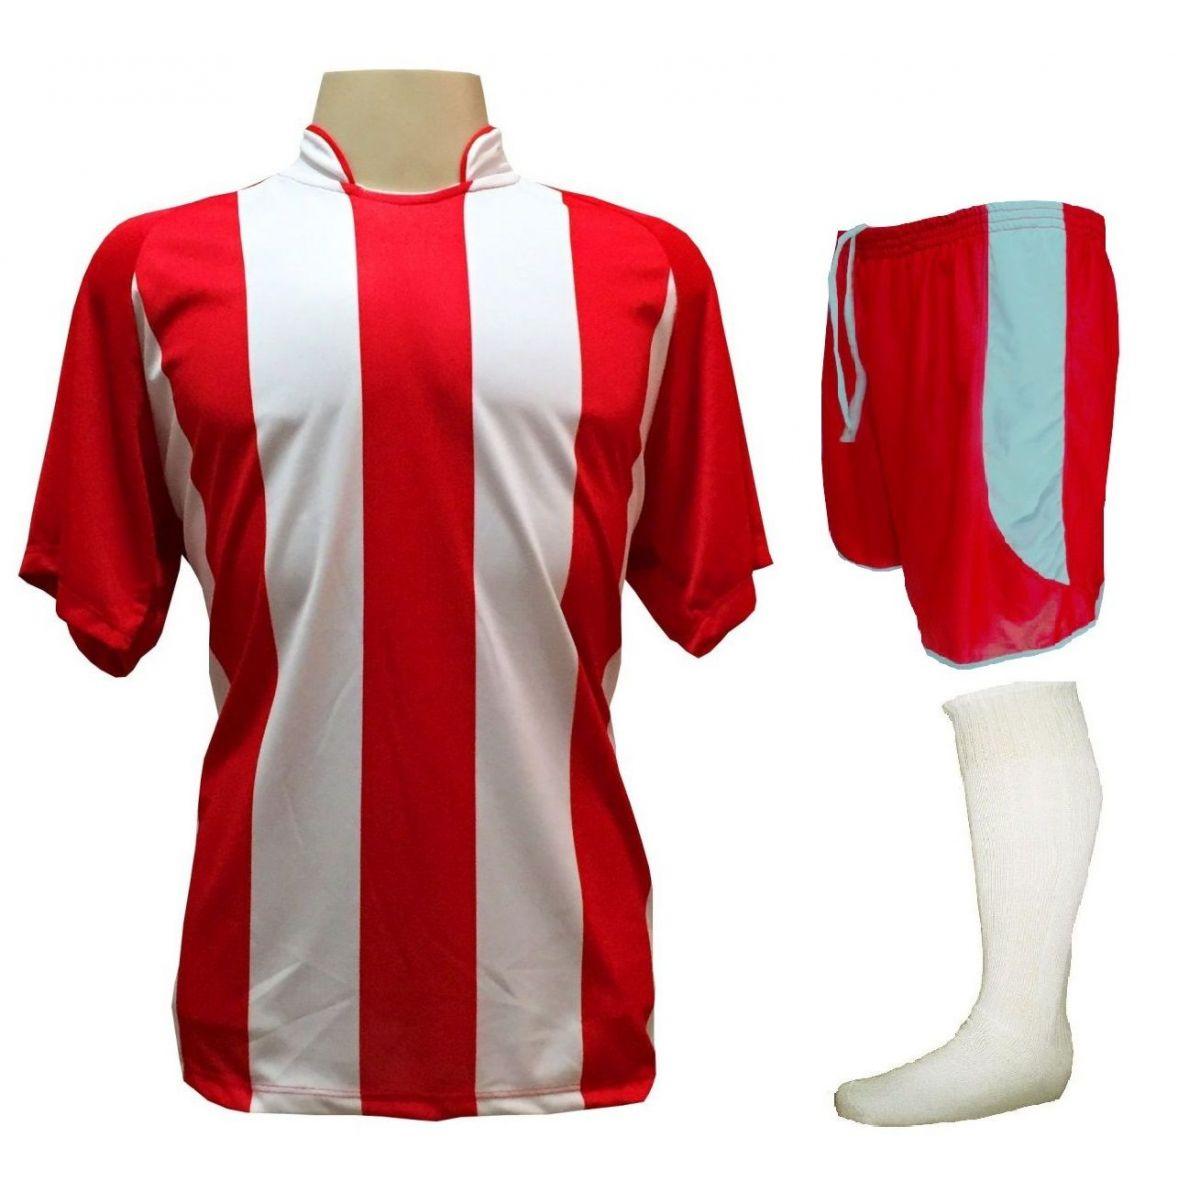 uniforme esportivo barato d1a7d4c2f075b